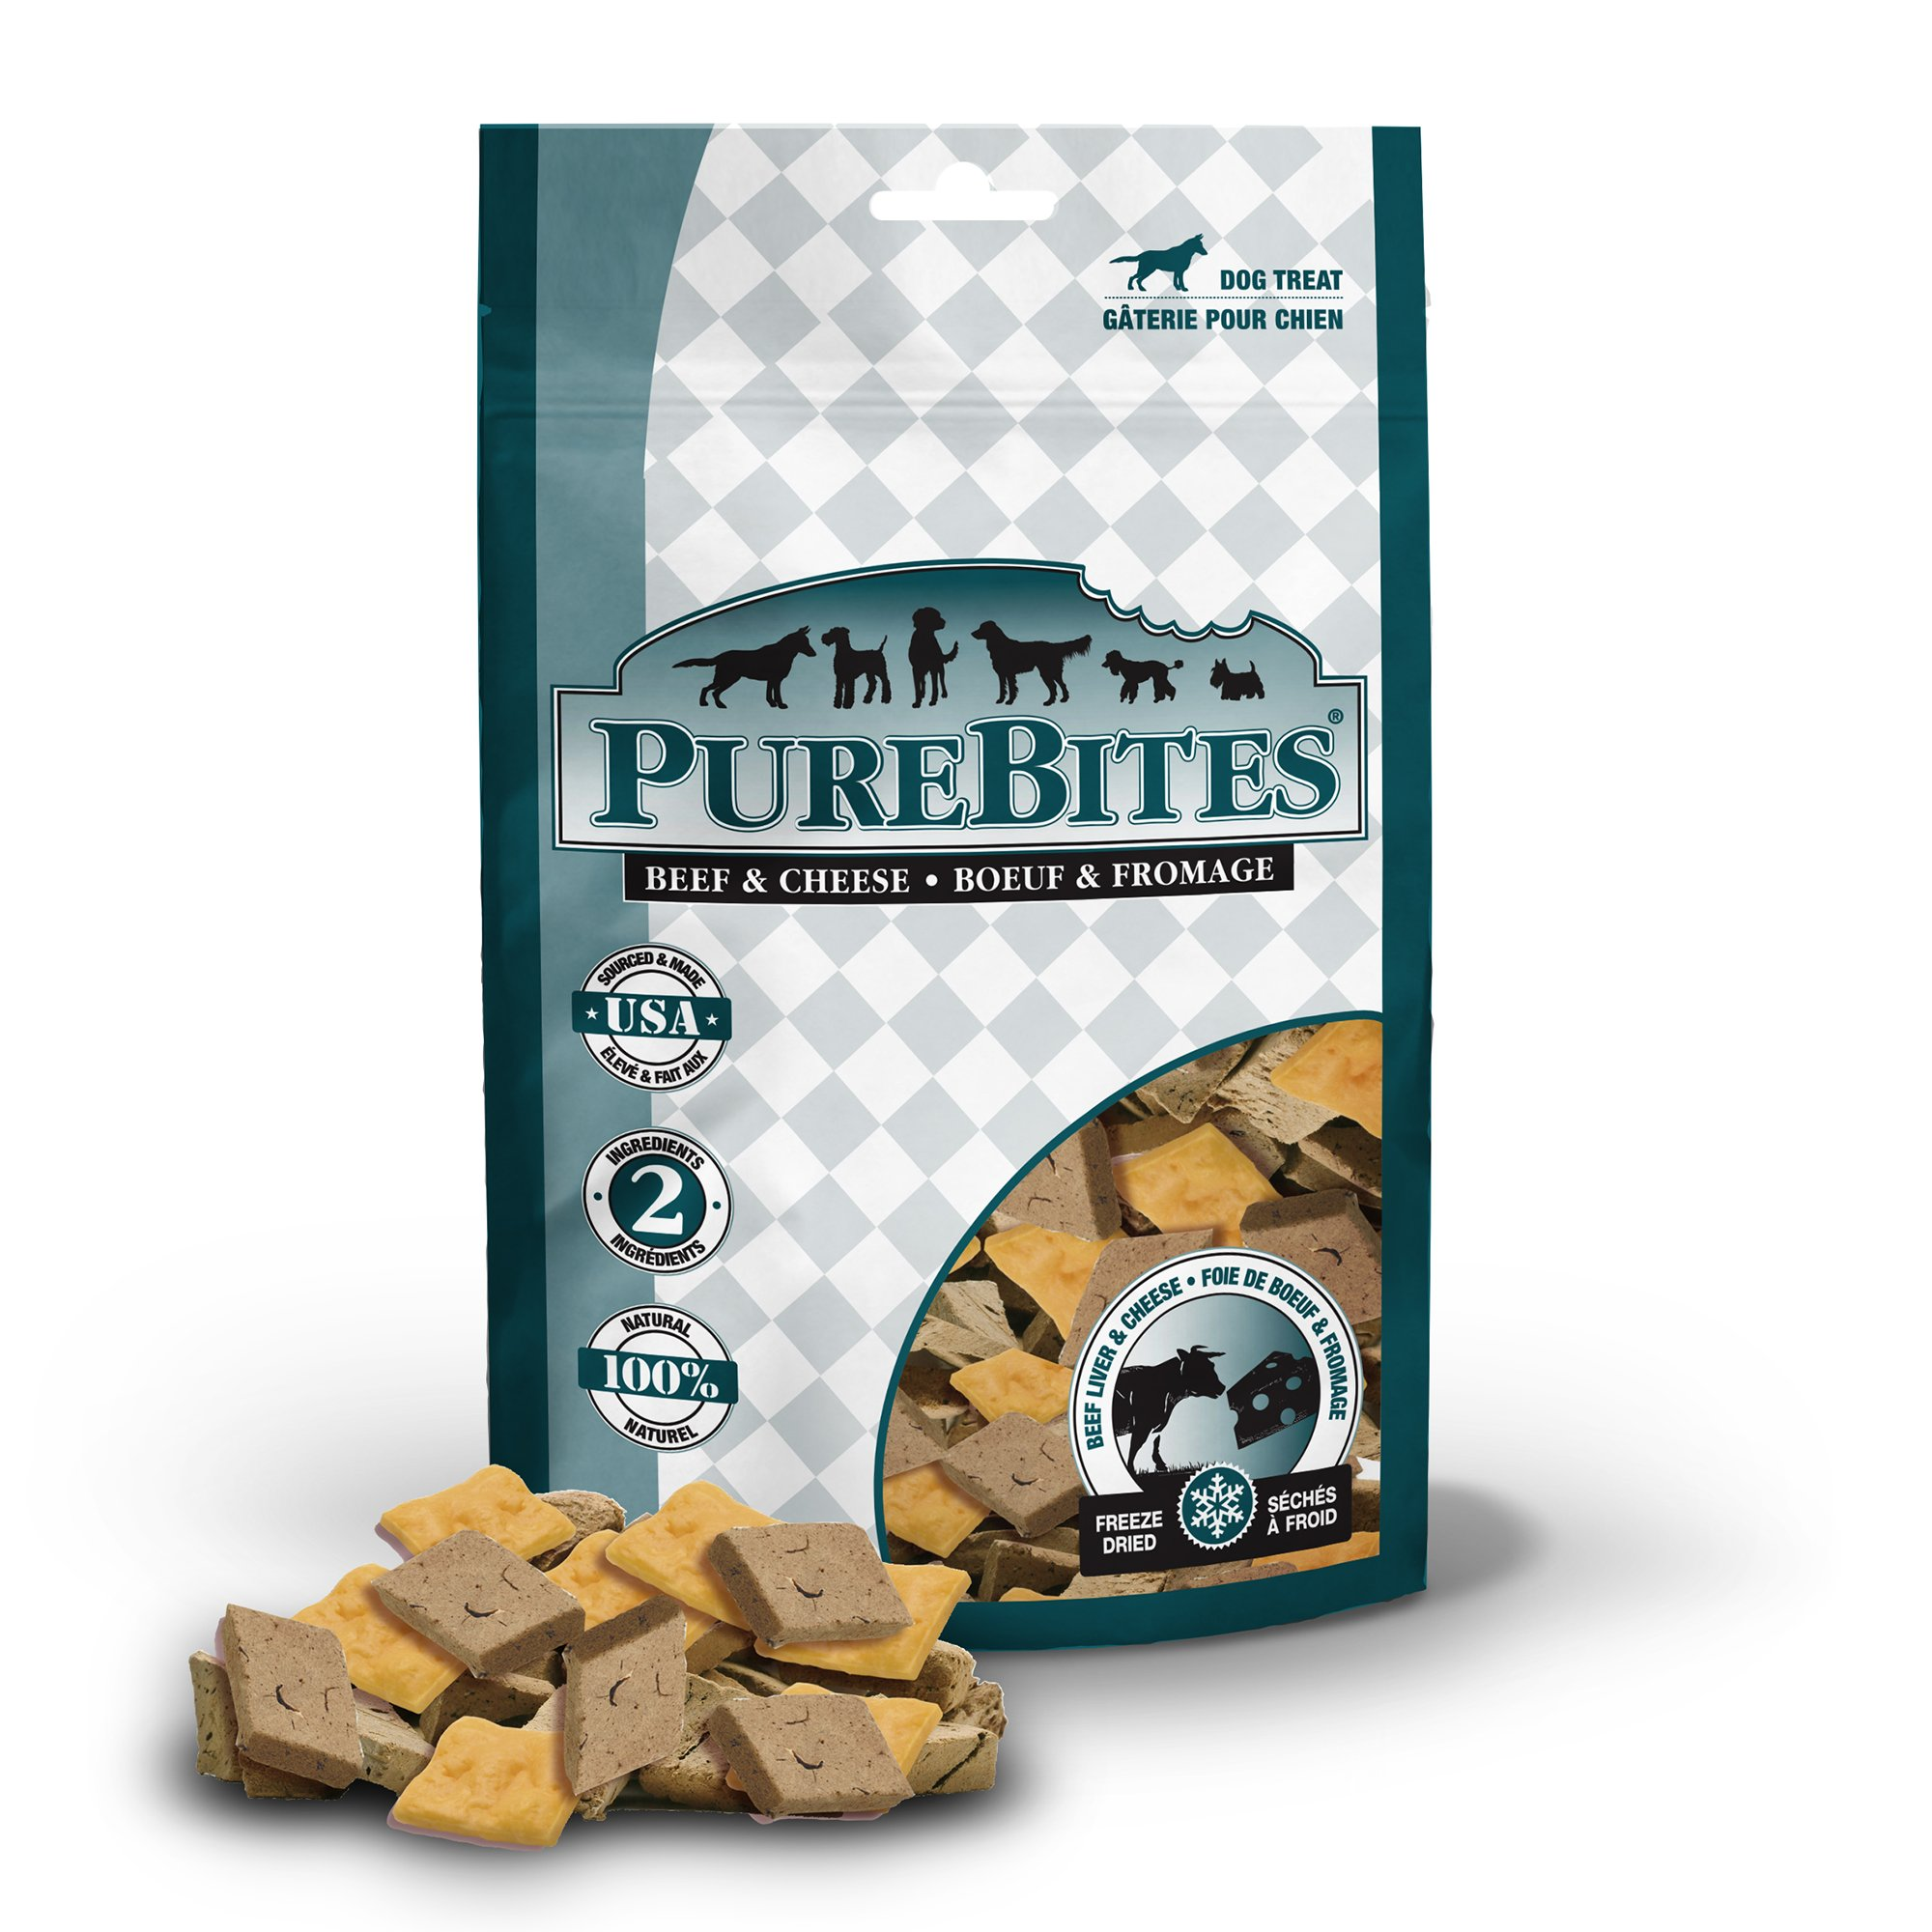 PureBites Beef & Cheese Mid Size Dog Treats